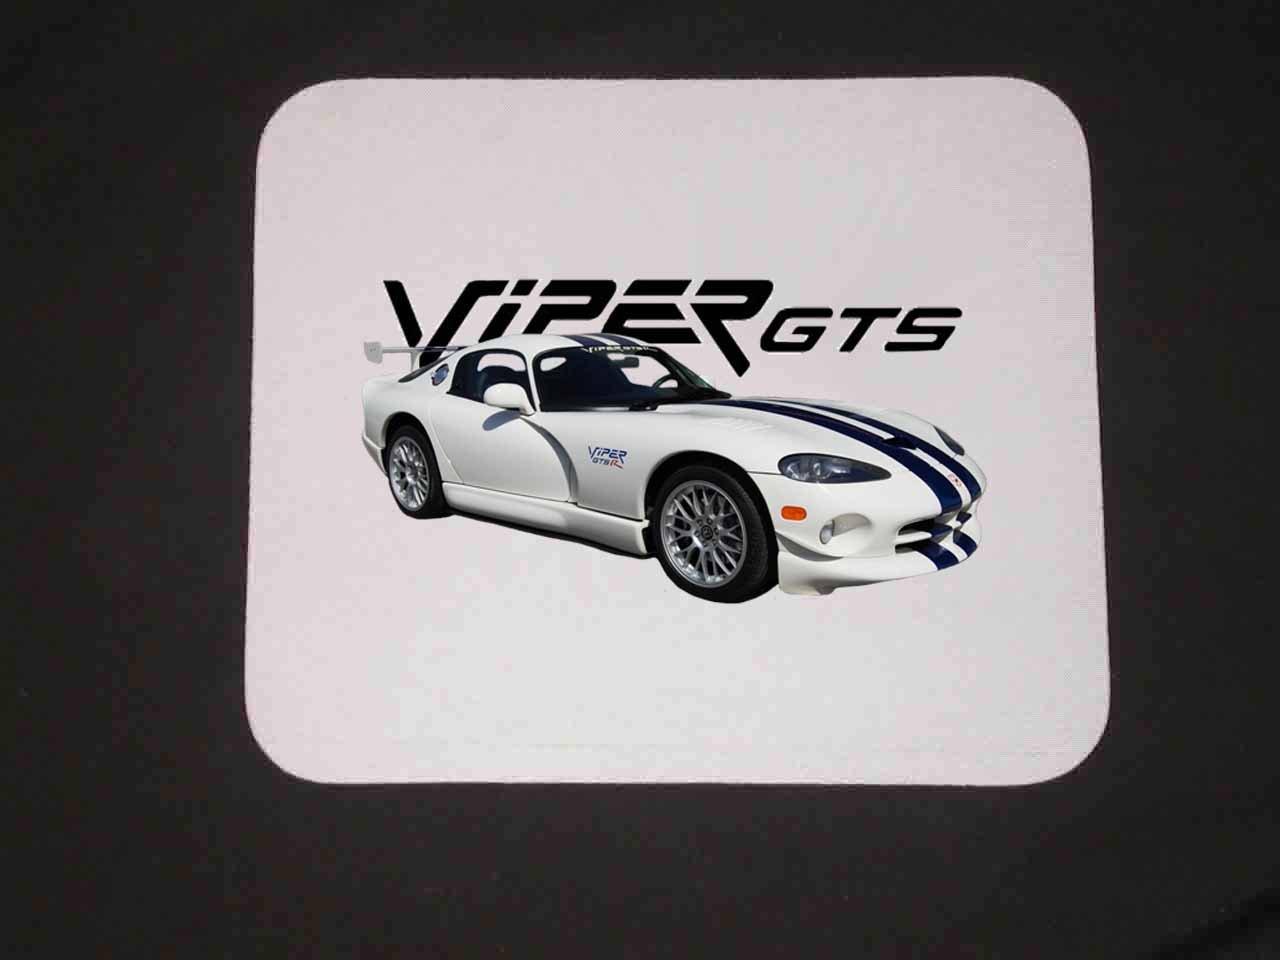 New Dodge Viper GTS Mousepad!!